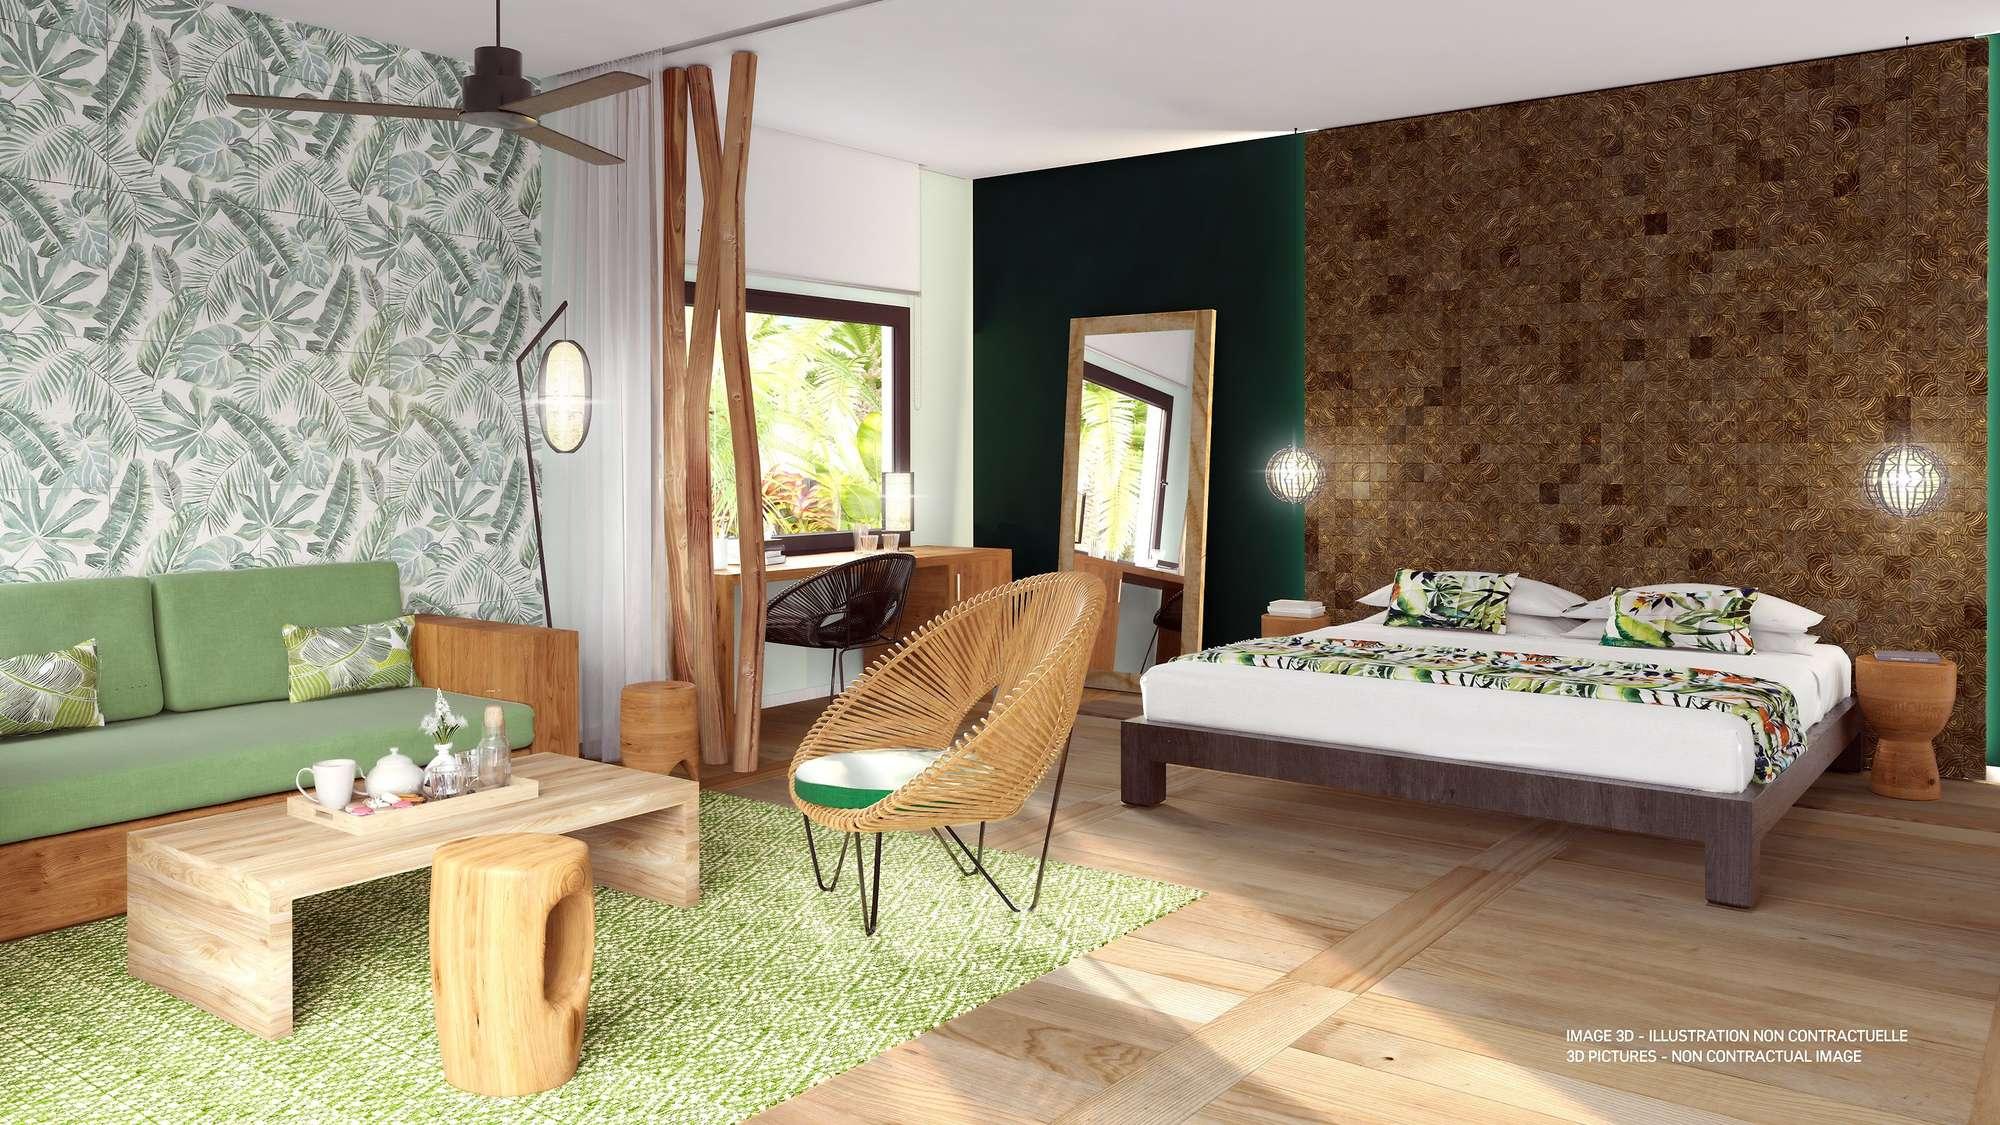 https___ns.clubmed.com_dream_EXCLUSIVE_COLLECTION_Resorts_Miches_Playa_Esmeralda_182704-axjgqm1gyl-swhr